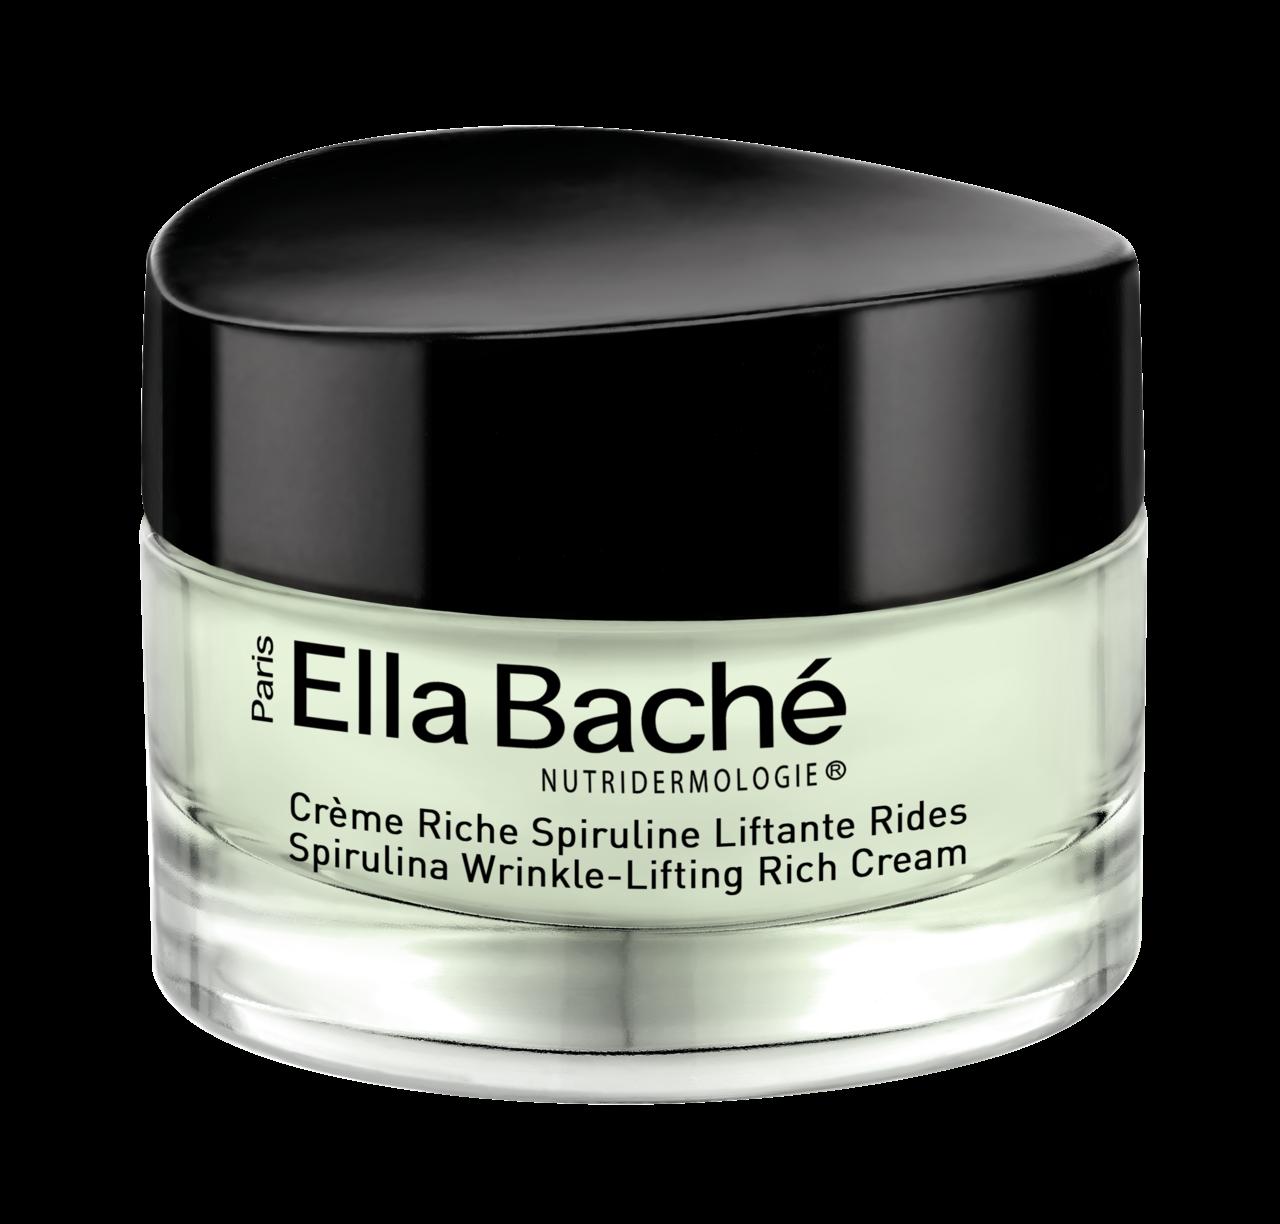 Ella Bache Spirulina Wrinkle-Lifting Rich Cream Спирулайн крем омолаживающий питательный 50 мл